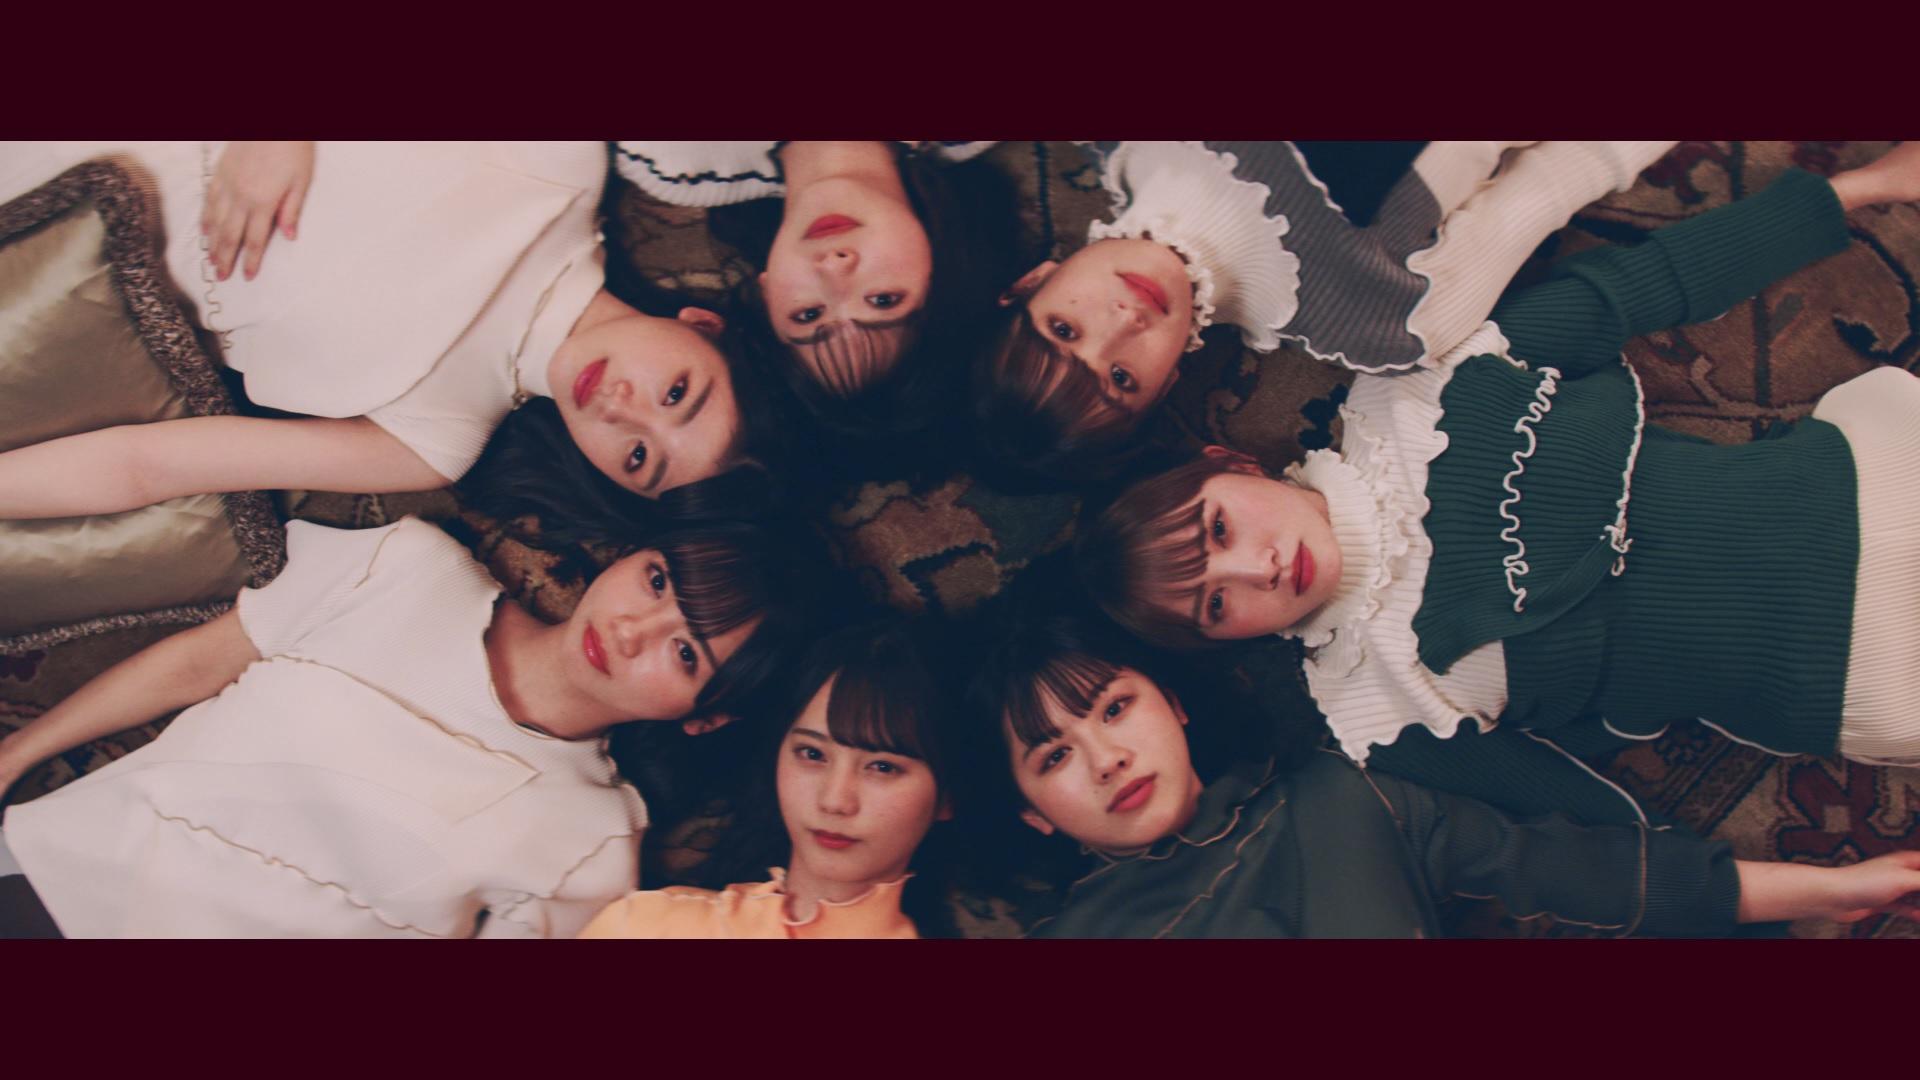 日向坂46 Hinatazaka46